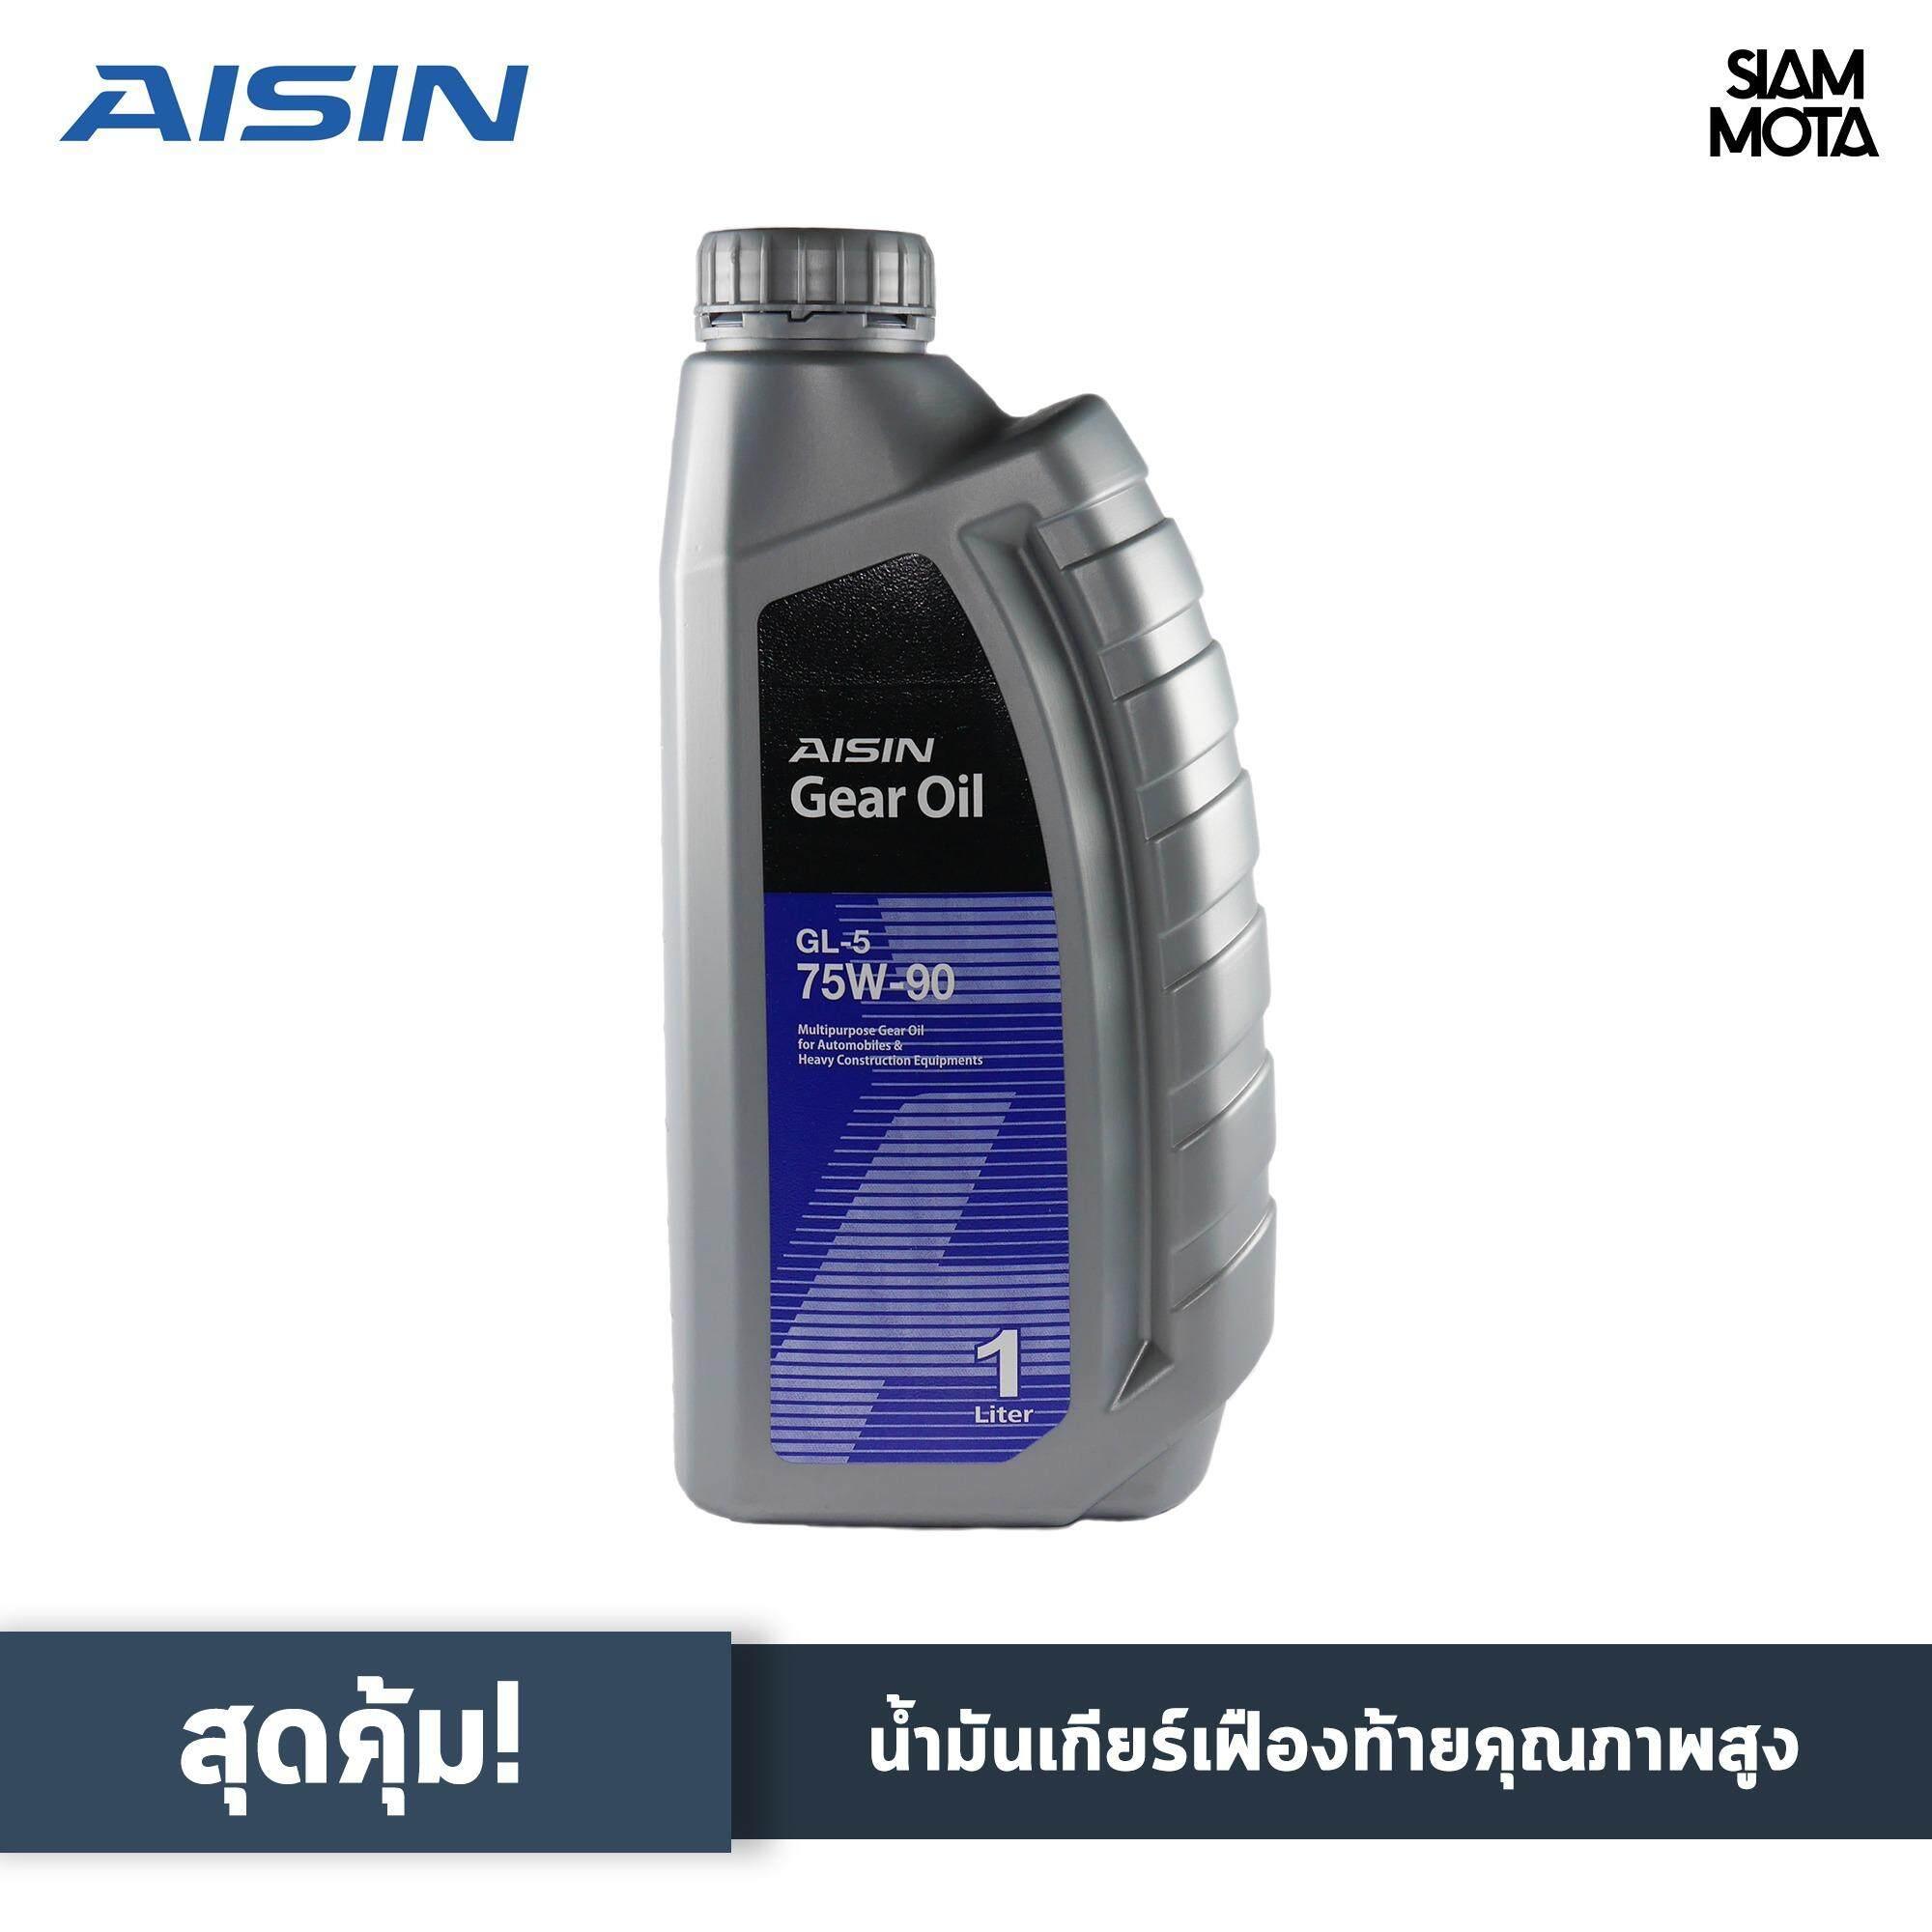 AISIN Gear Oil GL-5 75W-90 น้ำมันเกียร์เฟืองท้ายคุณภาพสูง ( 1 ลิตร )